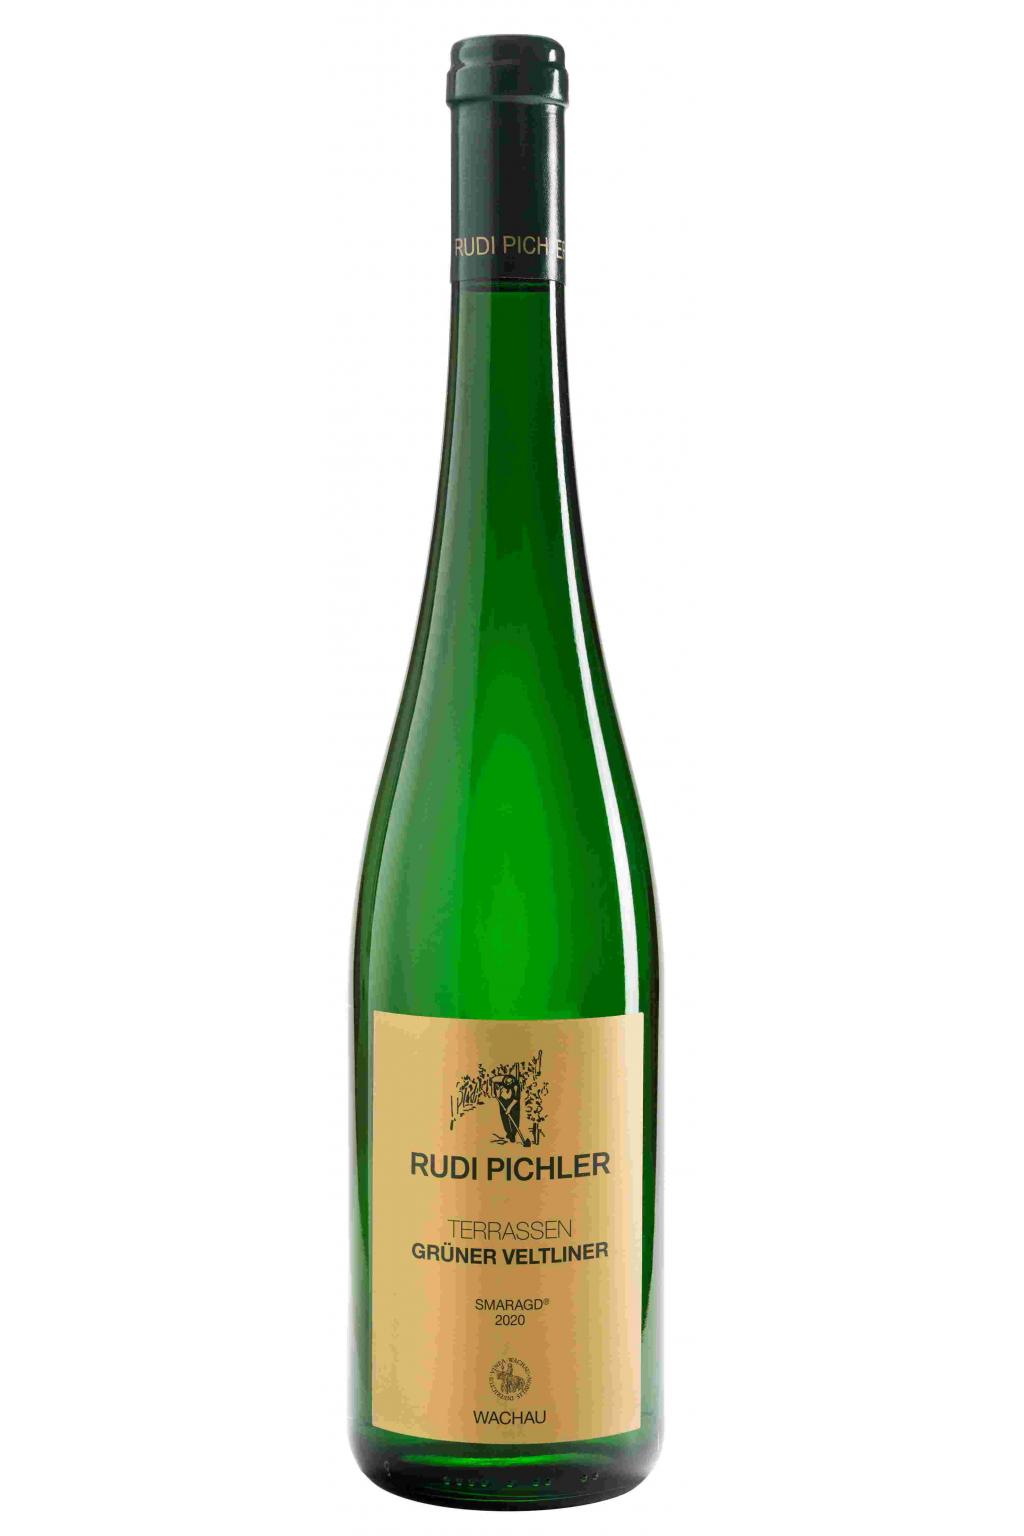 RudiPichler GV Terrassen Smaragd 2020 web